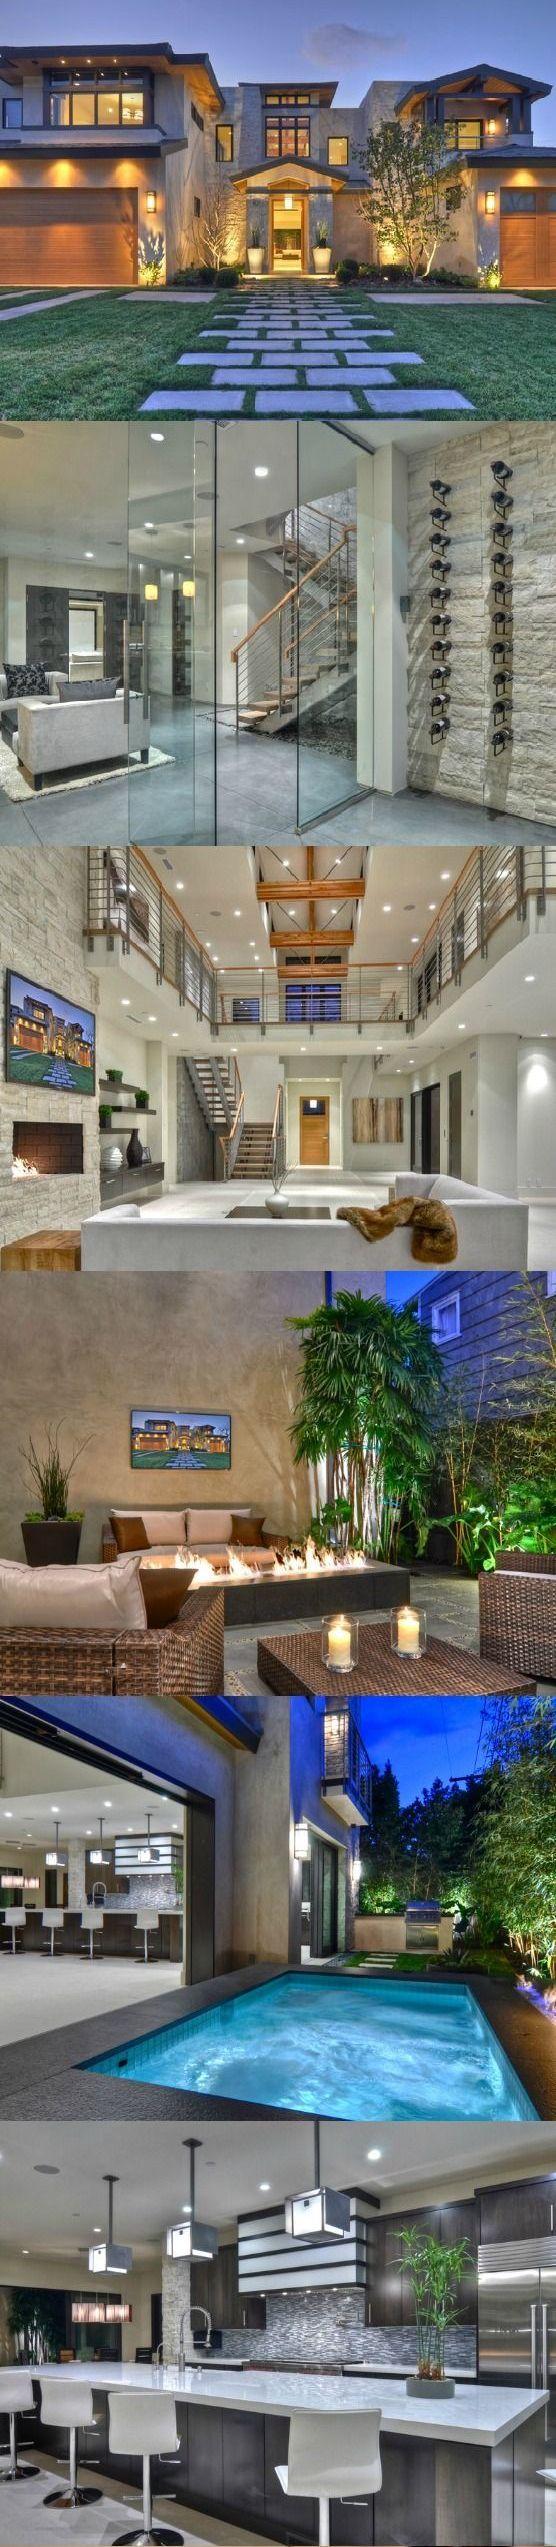 Best Kitchen Gallery: 158 Best Dream Spacez Images On Pinterest Attic Contemporary of Dream House In Houston Ems on rachelxblog.com